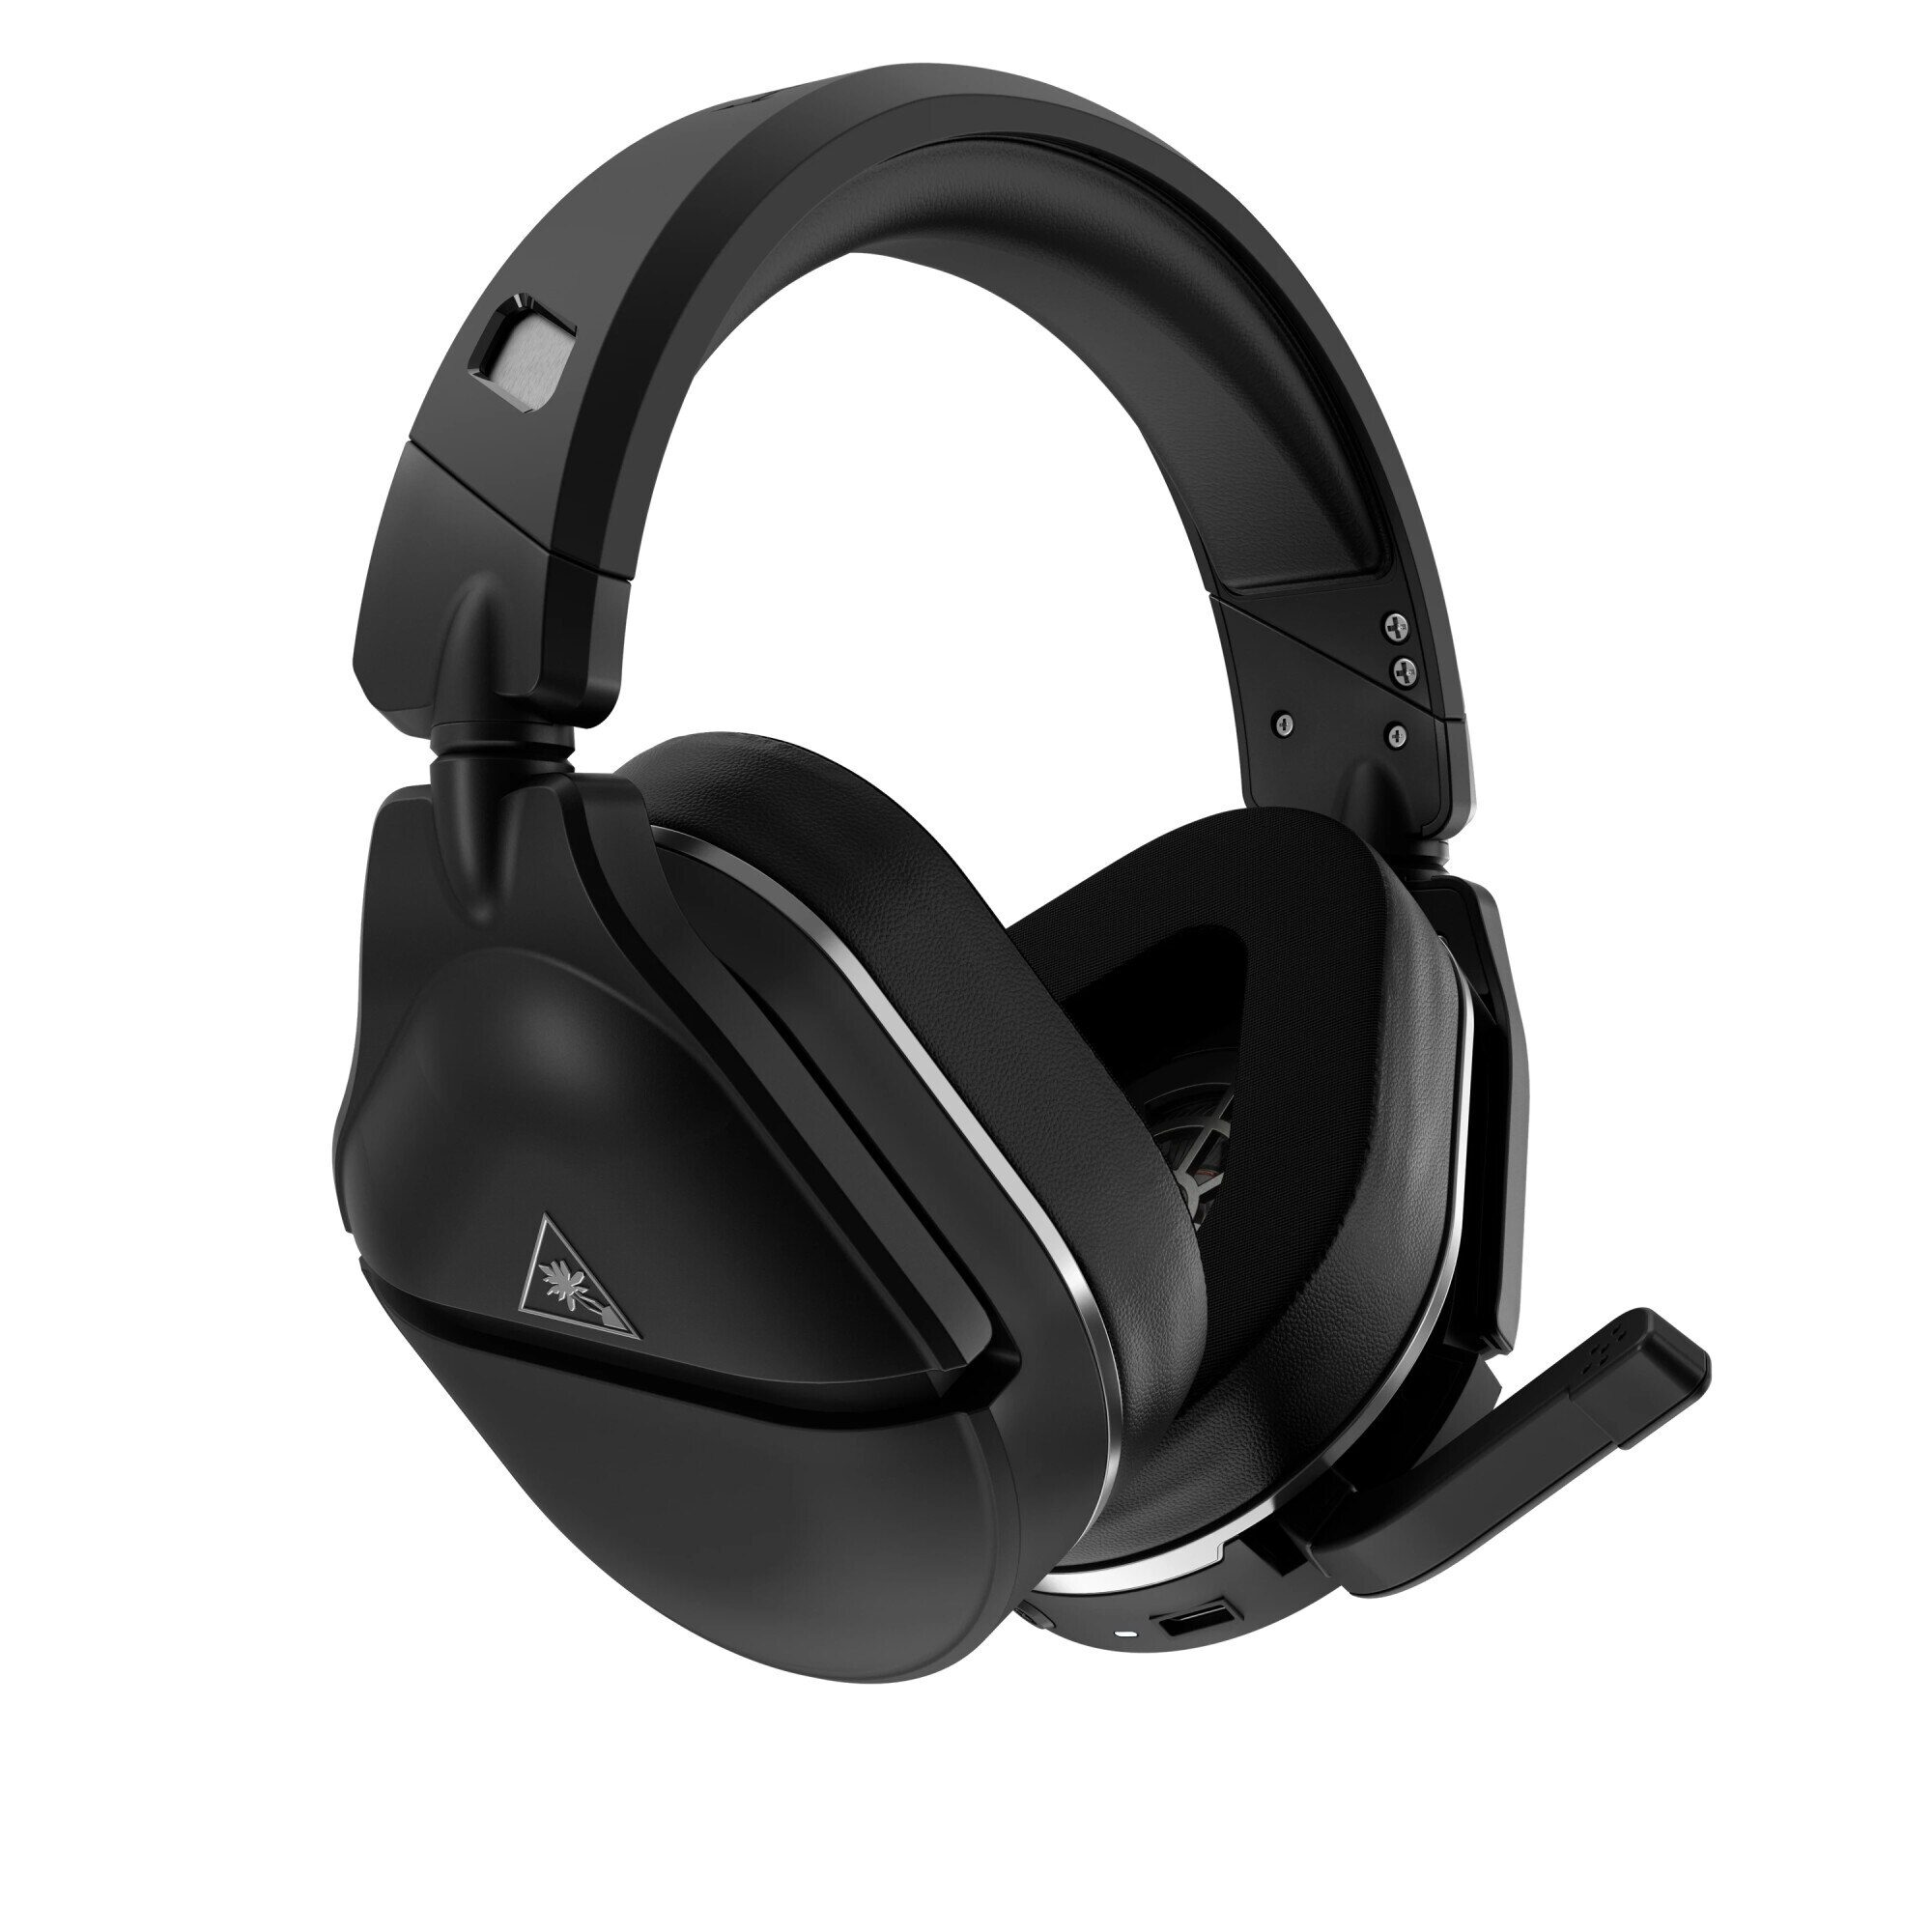 Fotografie Casti gaming wireless TurtleBeach Stealth 700 Gen. 2, PS5, PS4, multiplatforma, Bluetooth, Negru